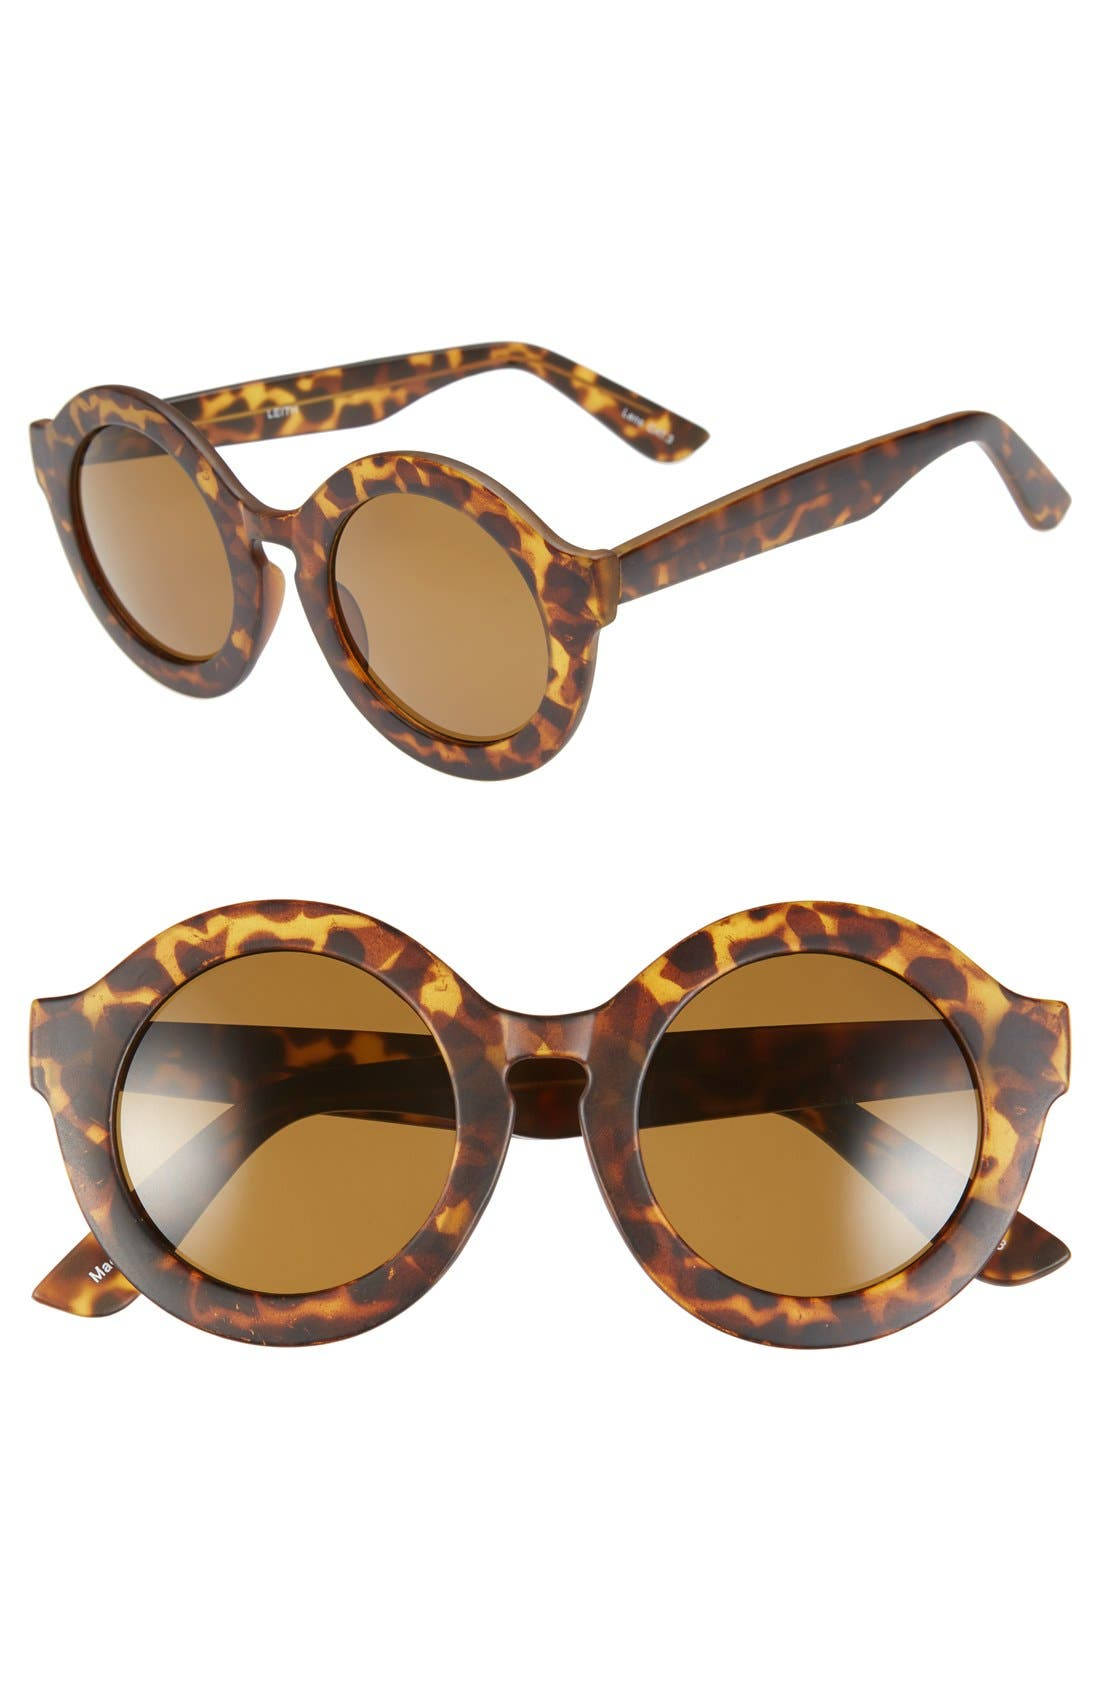 Alternate Image 1 Selected - Leith 'Penelope' Tortoise' Round Sunglasses